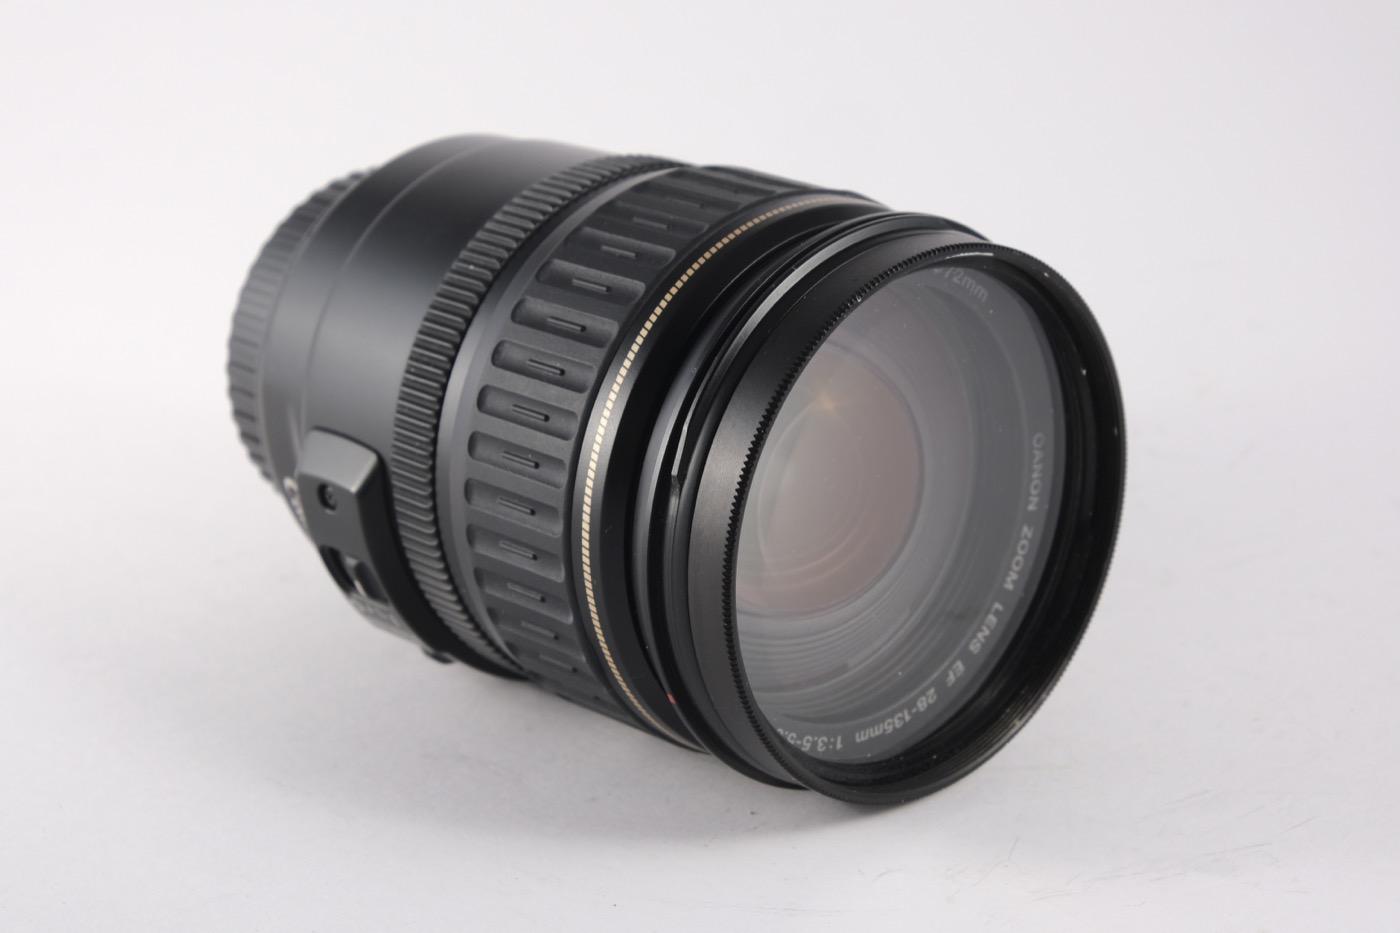 Canon EF 28-135mm f/3.5-f/5.6 IS USM zoom lens